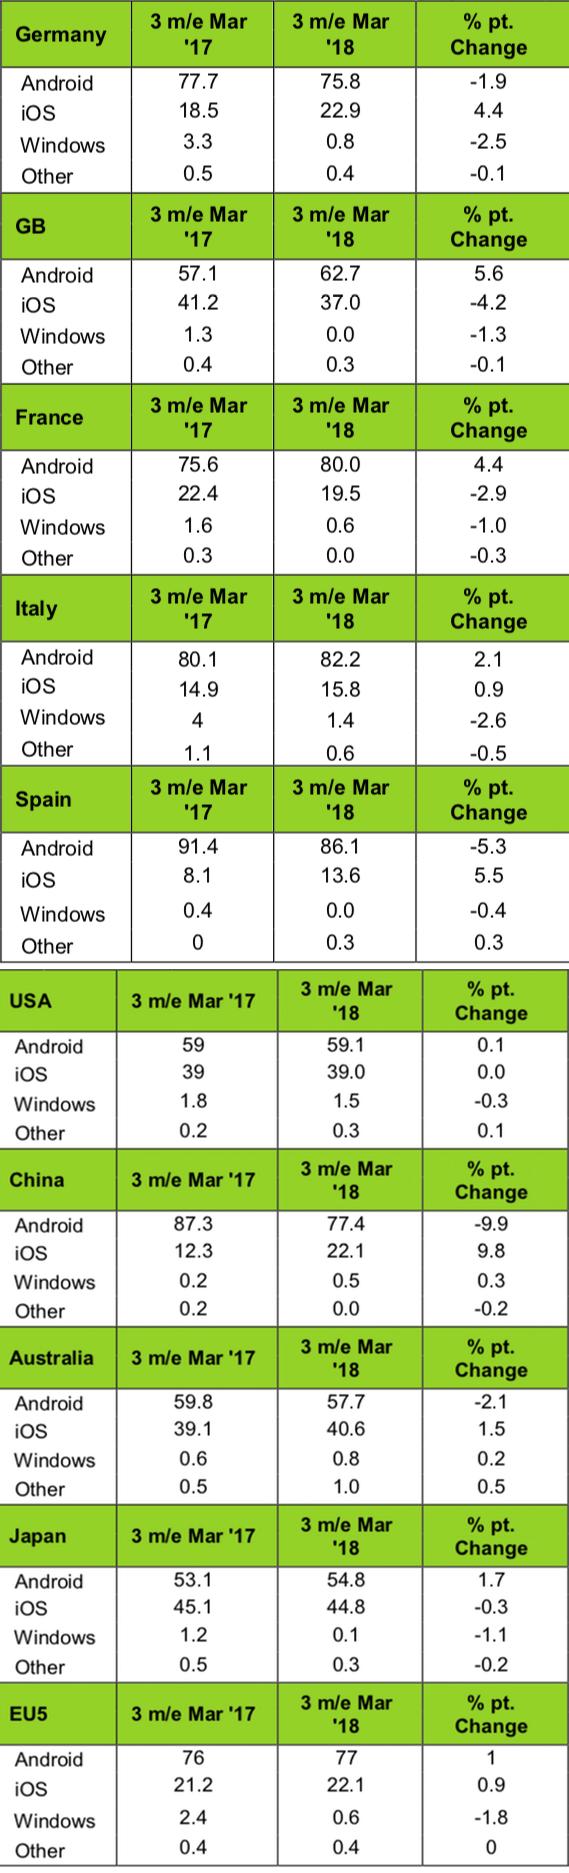 Kantar: Smartphone OS Sales Share (%)